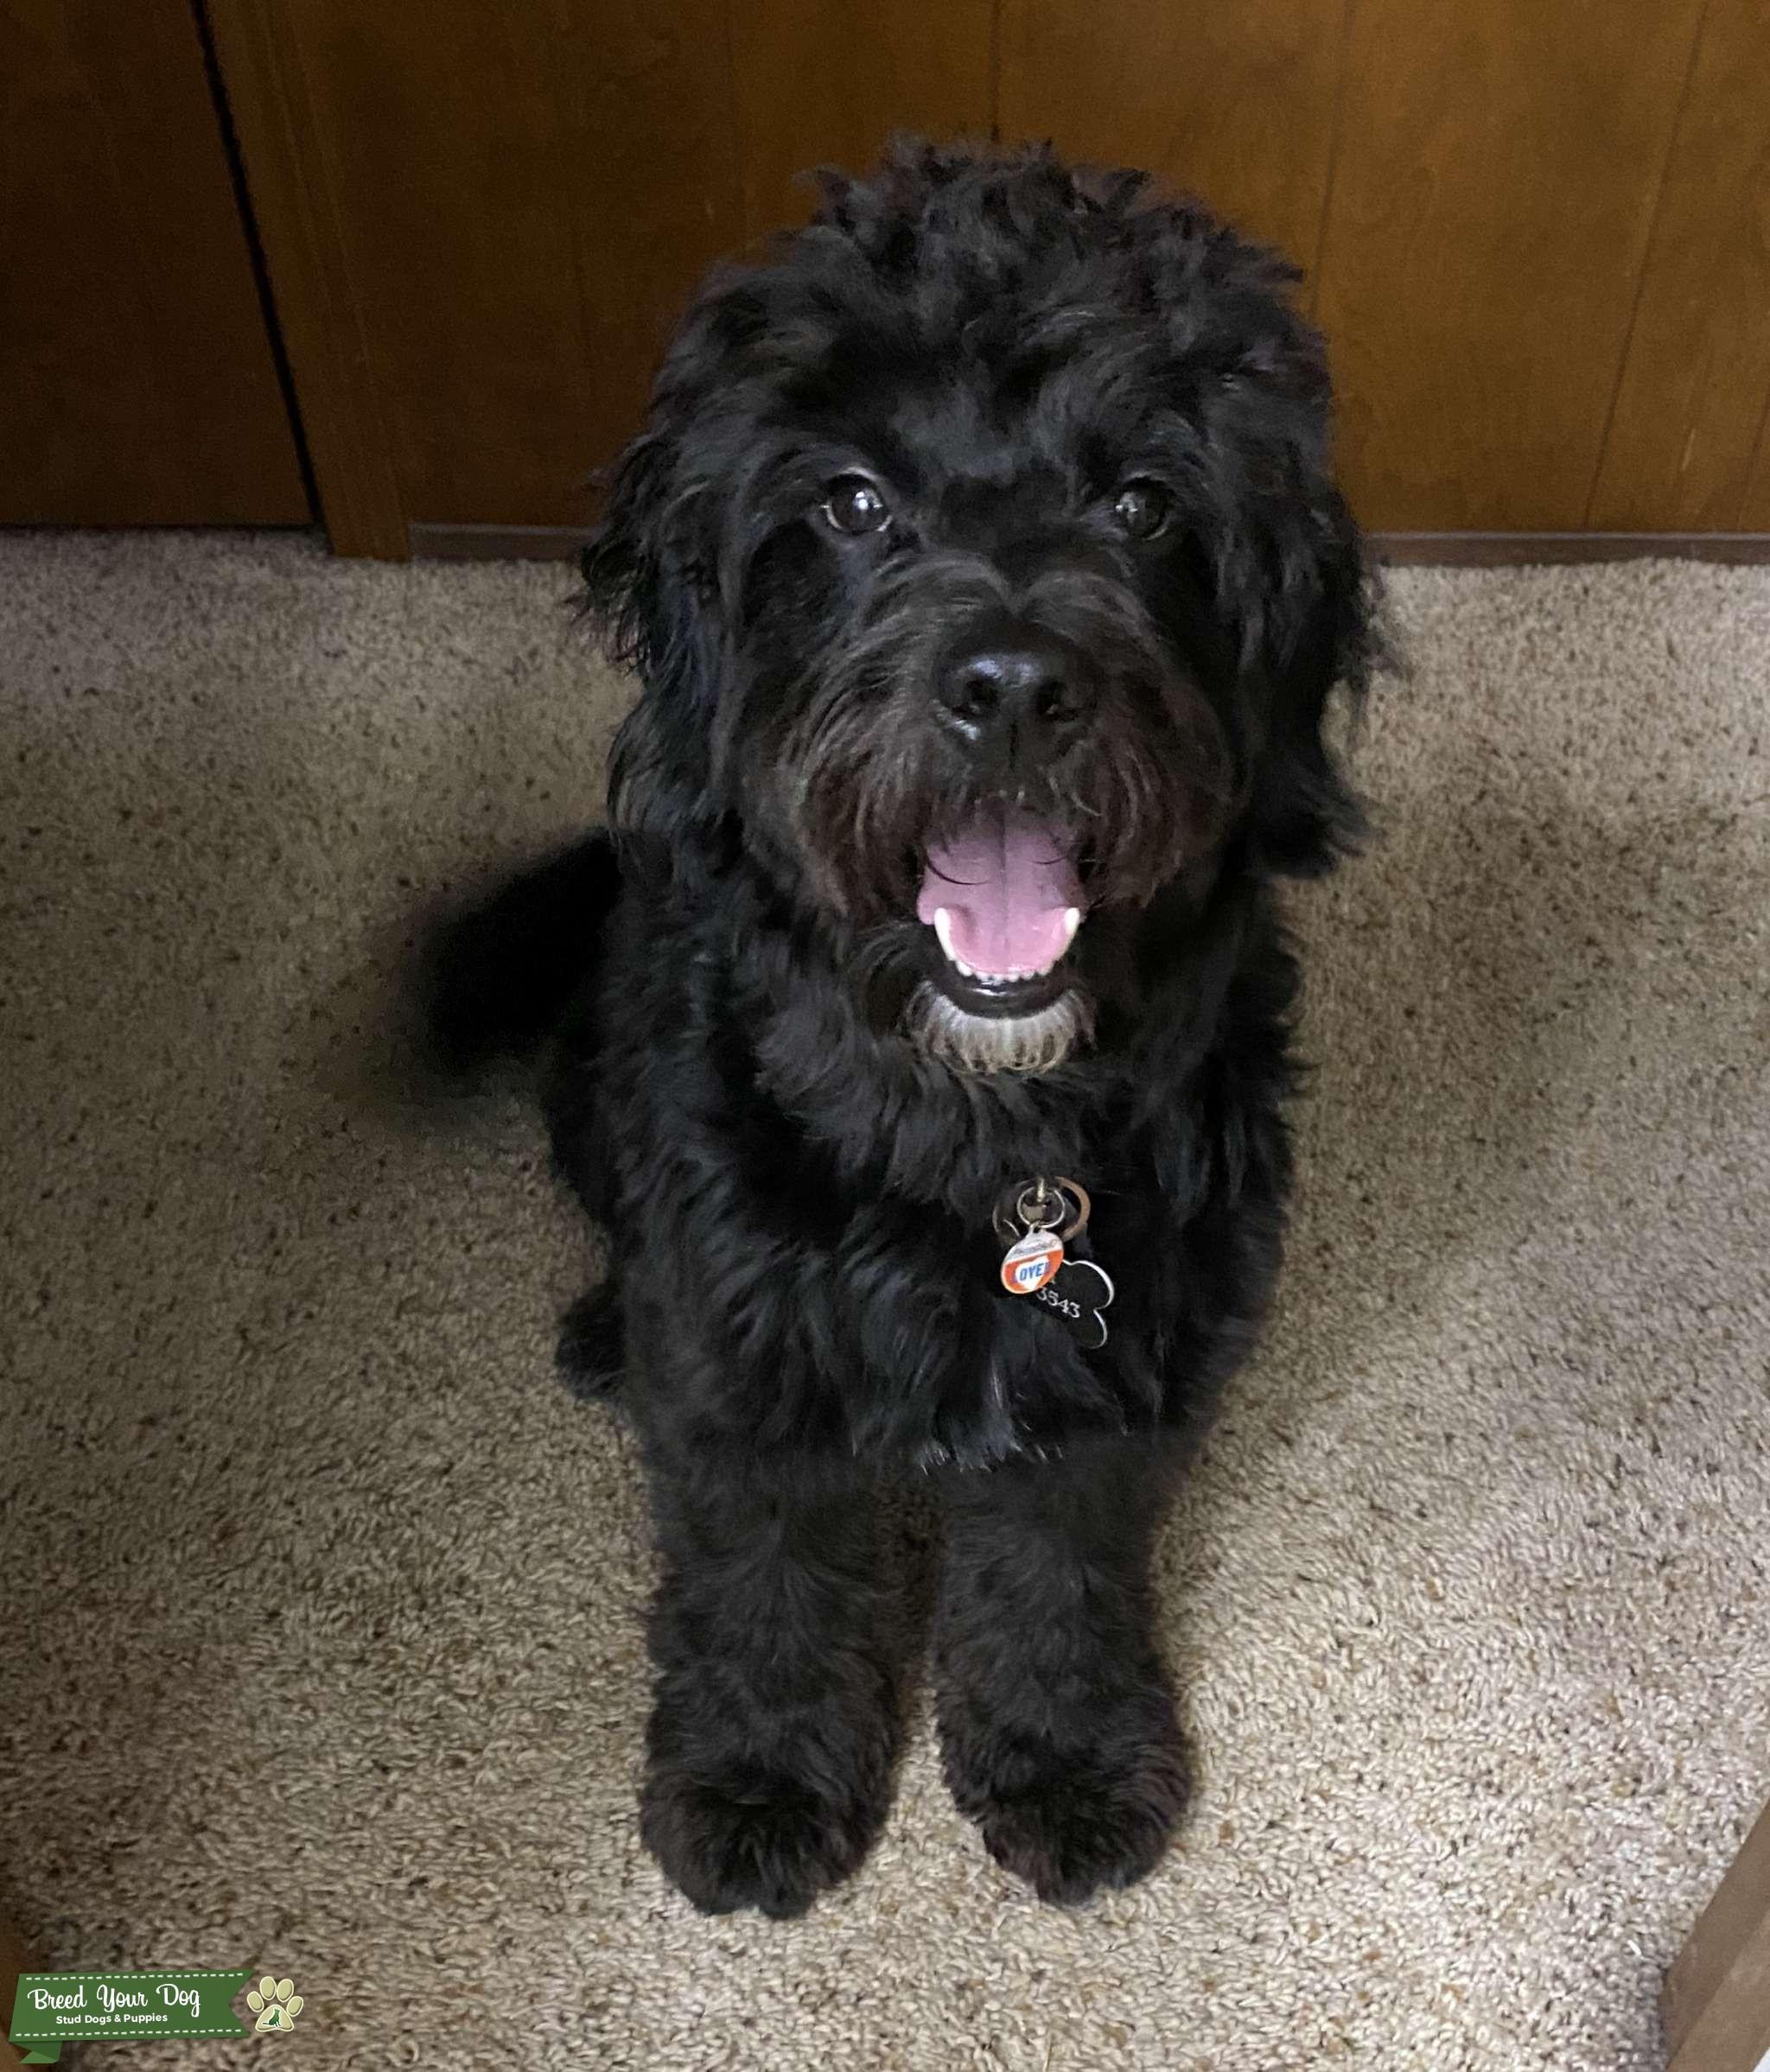 Stud Dog Black Mini Goldendoodle Breed Your Dog